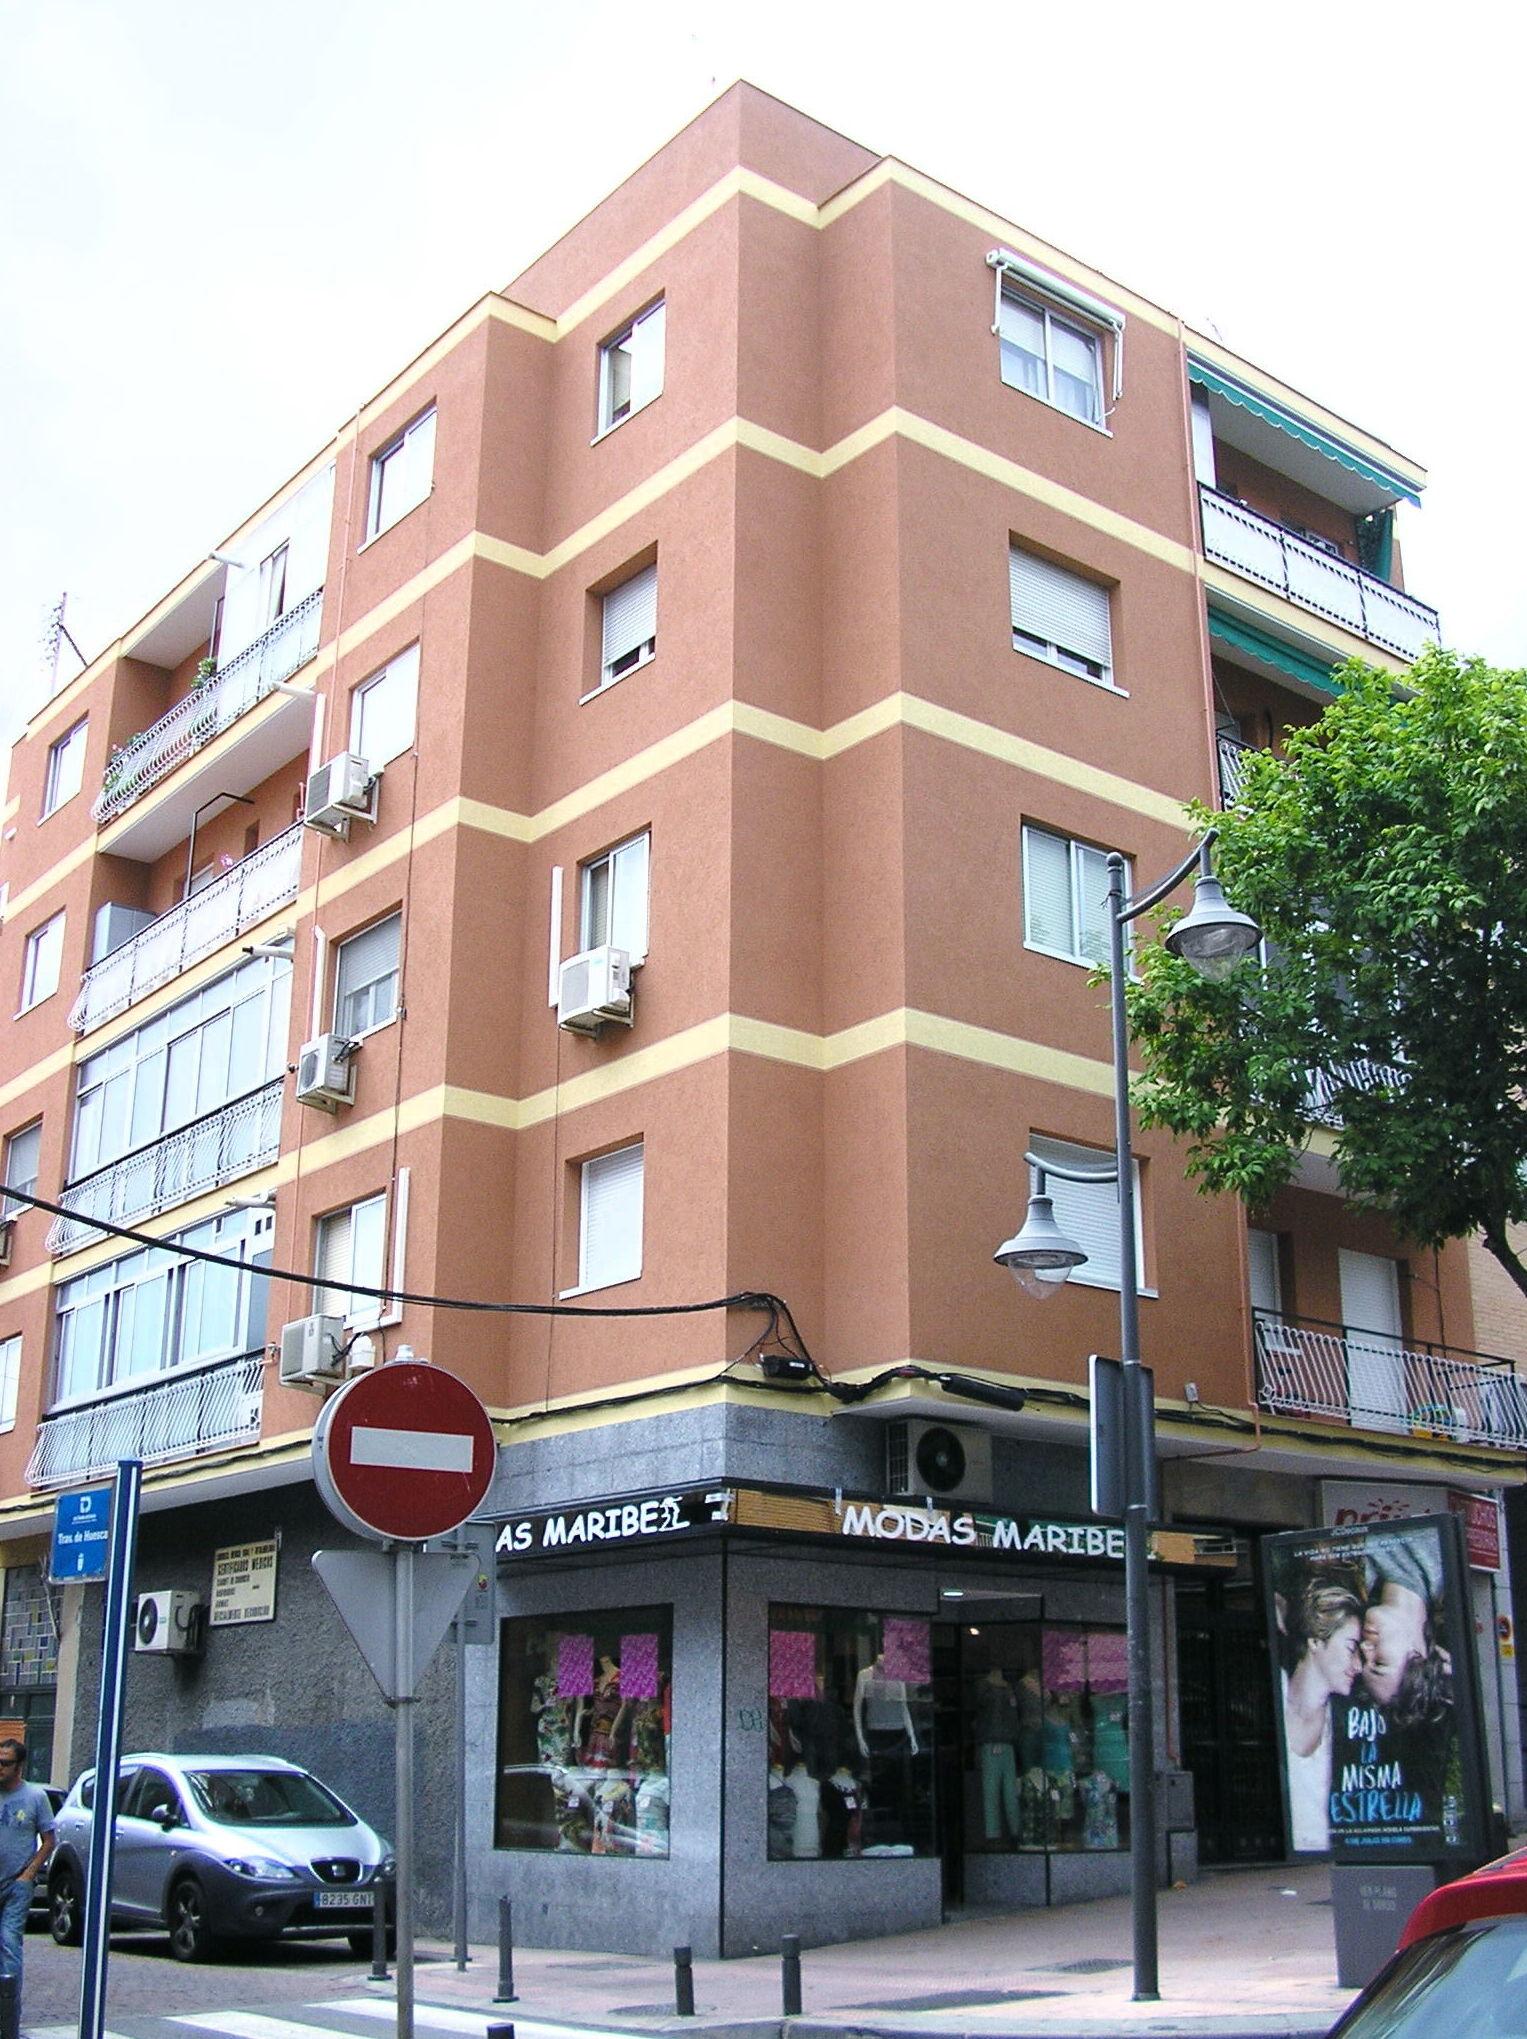 Foto 3 de Rehabilitación de edificios en Madrid | Elax Rehabilitación